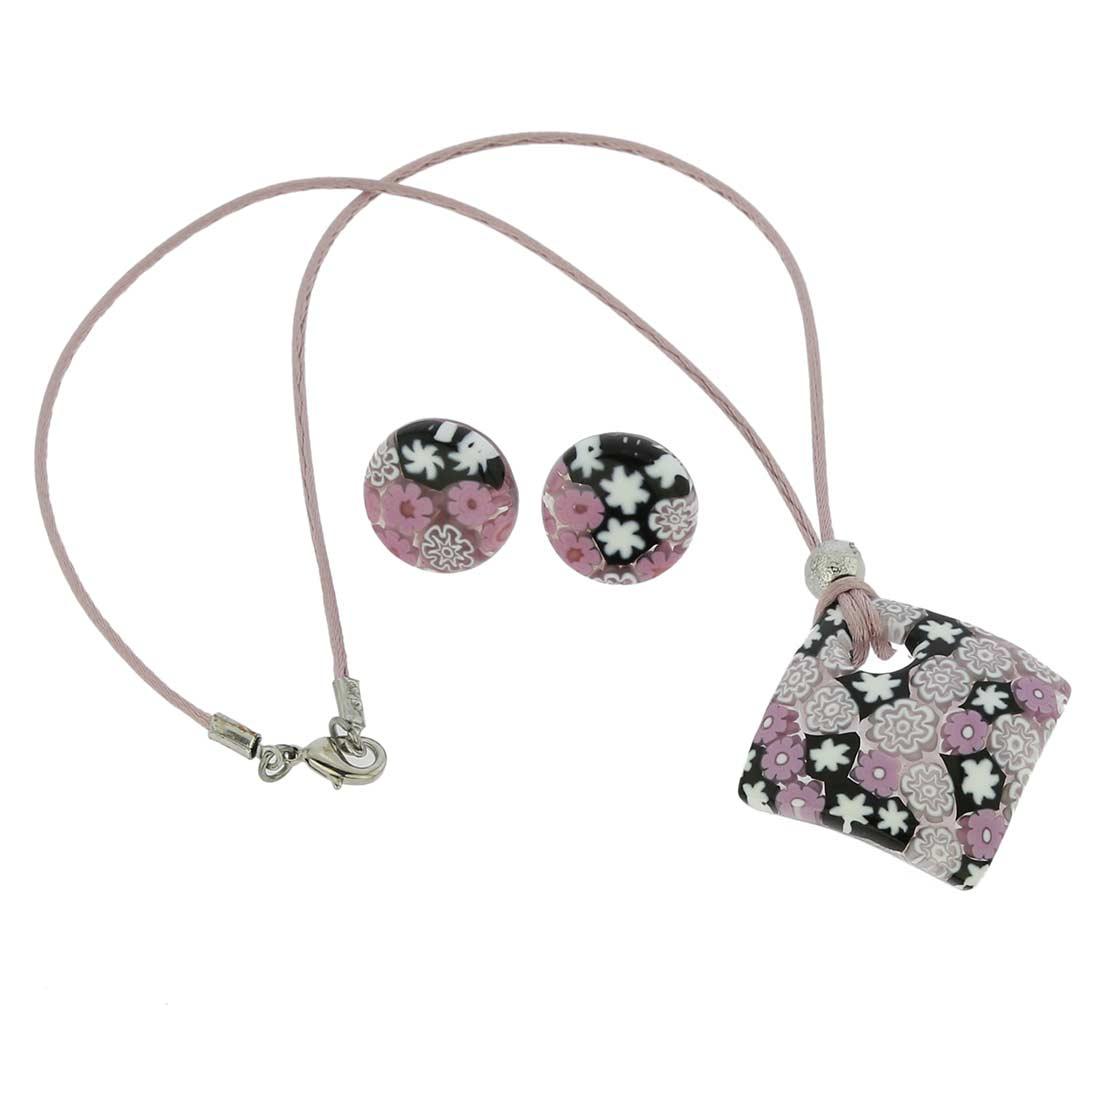 Arlecchino Murano Millefiori Jewelry Set - Lilac